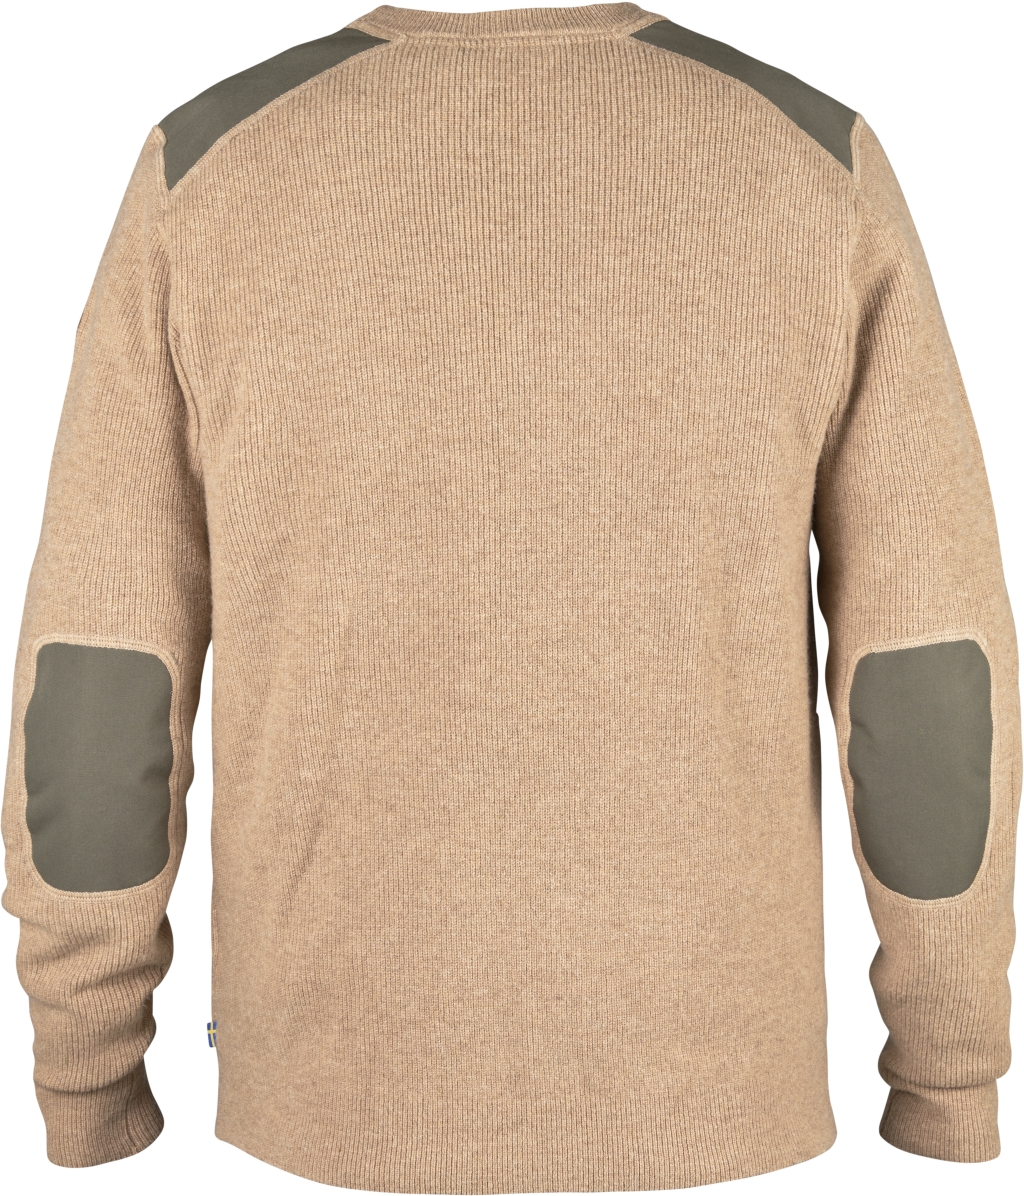 FjallRaven Sormland Crew Sweater Sand-30